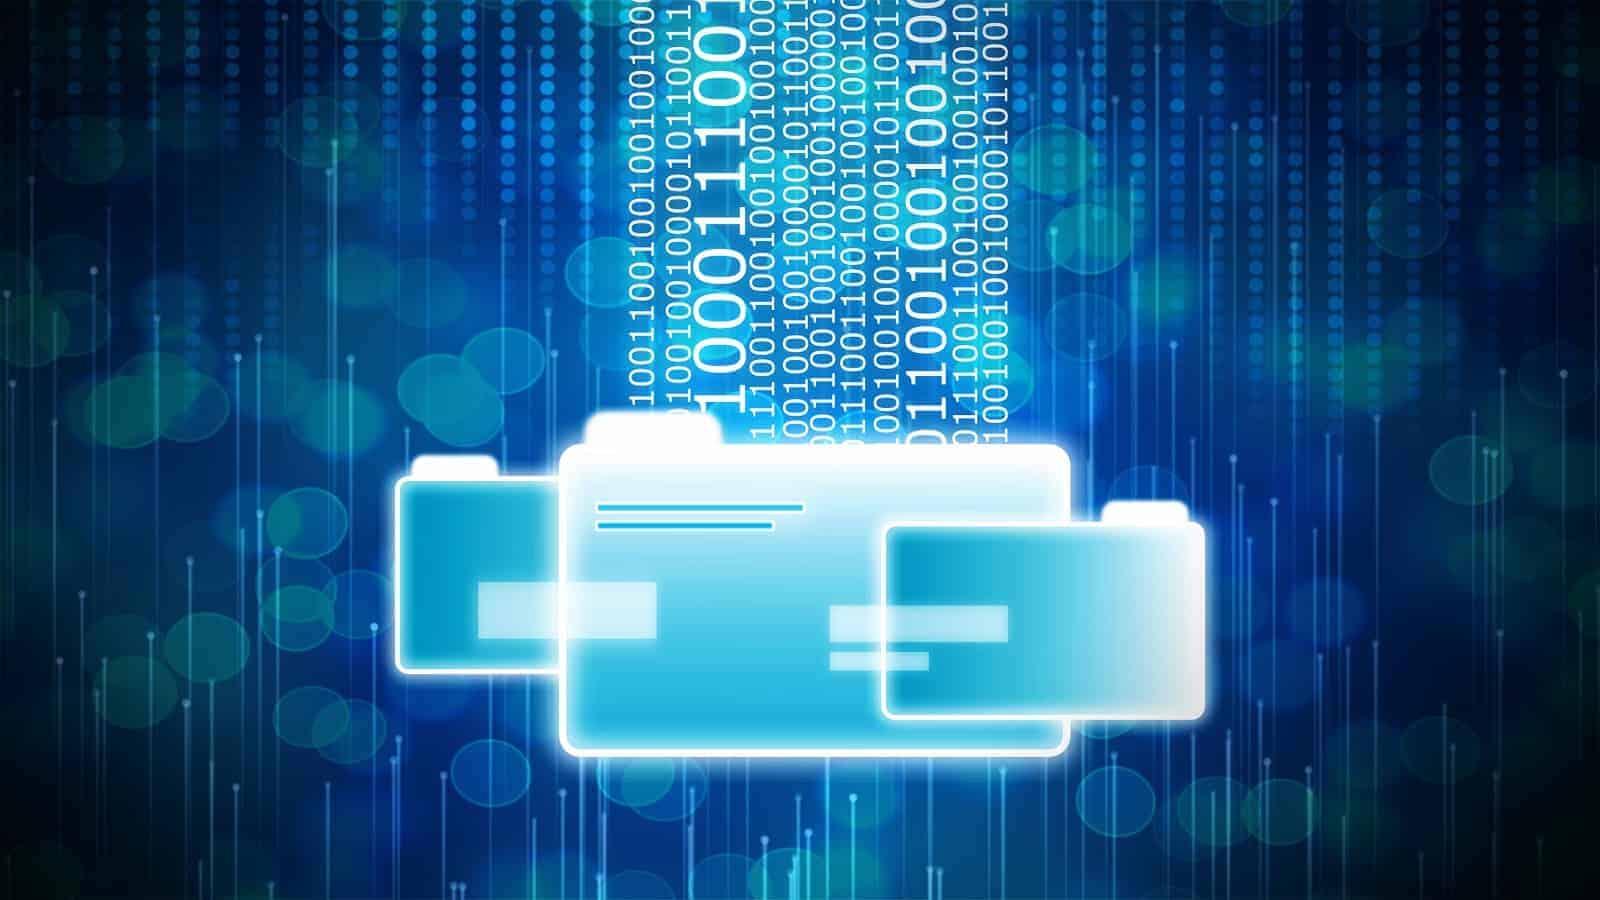 Filecoin data storage